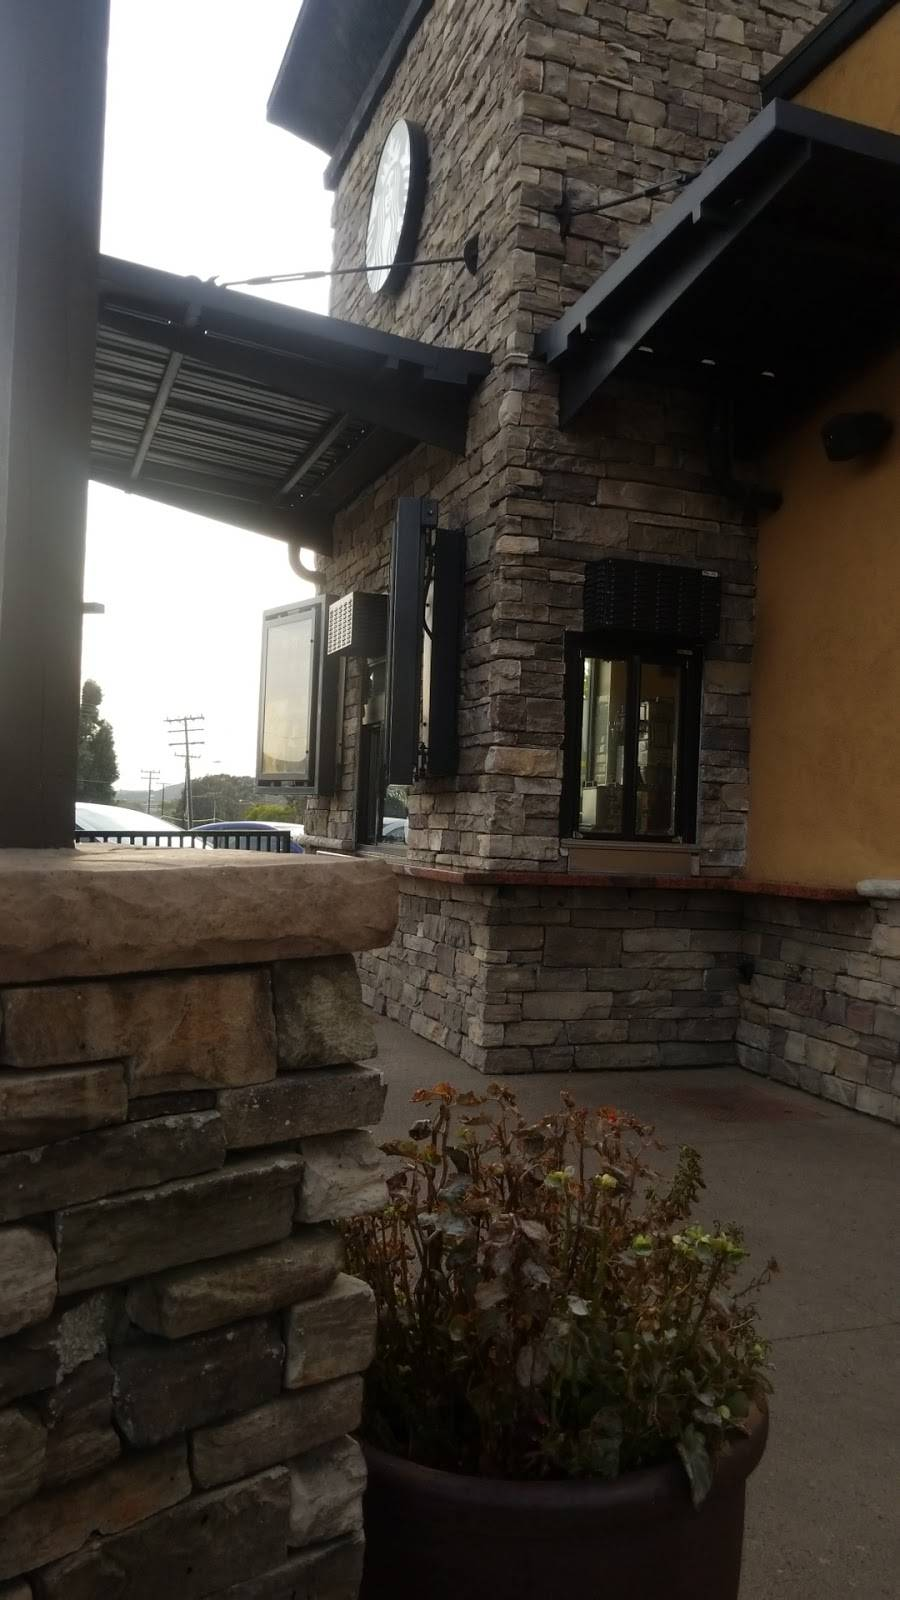 Starbucks   cafe   2101 Murchison Ave, Pomona, CA 91768, USA   9096293194 OR +1 909-629-3194